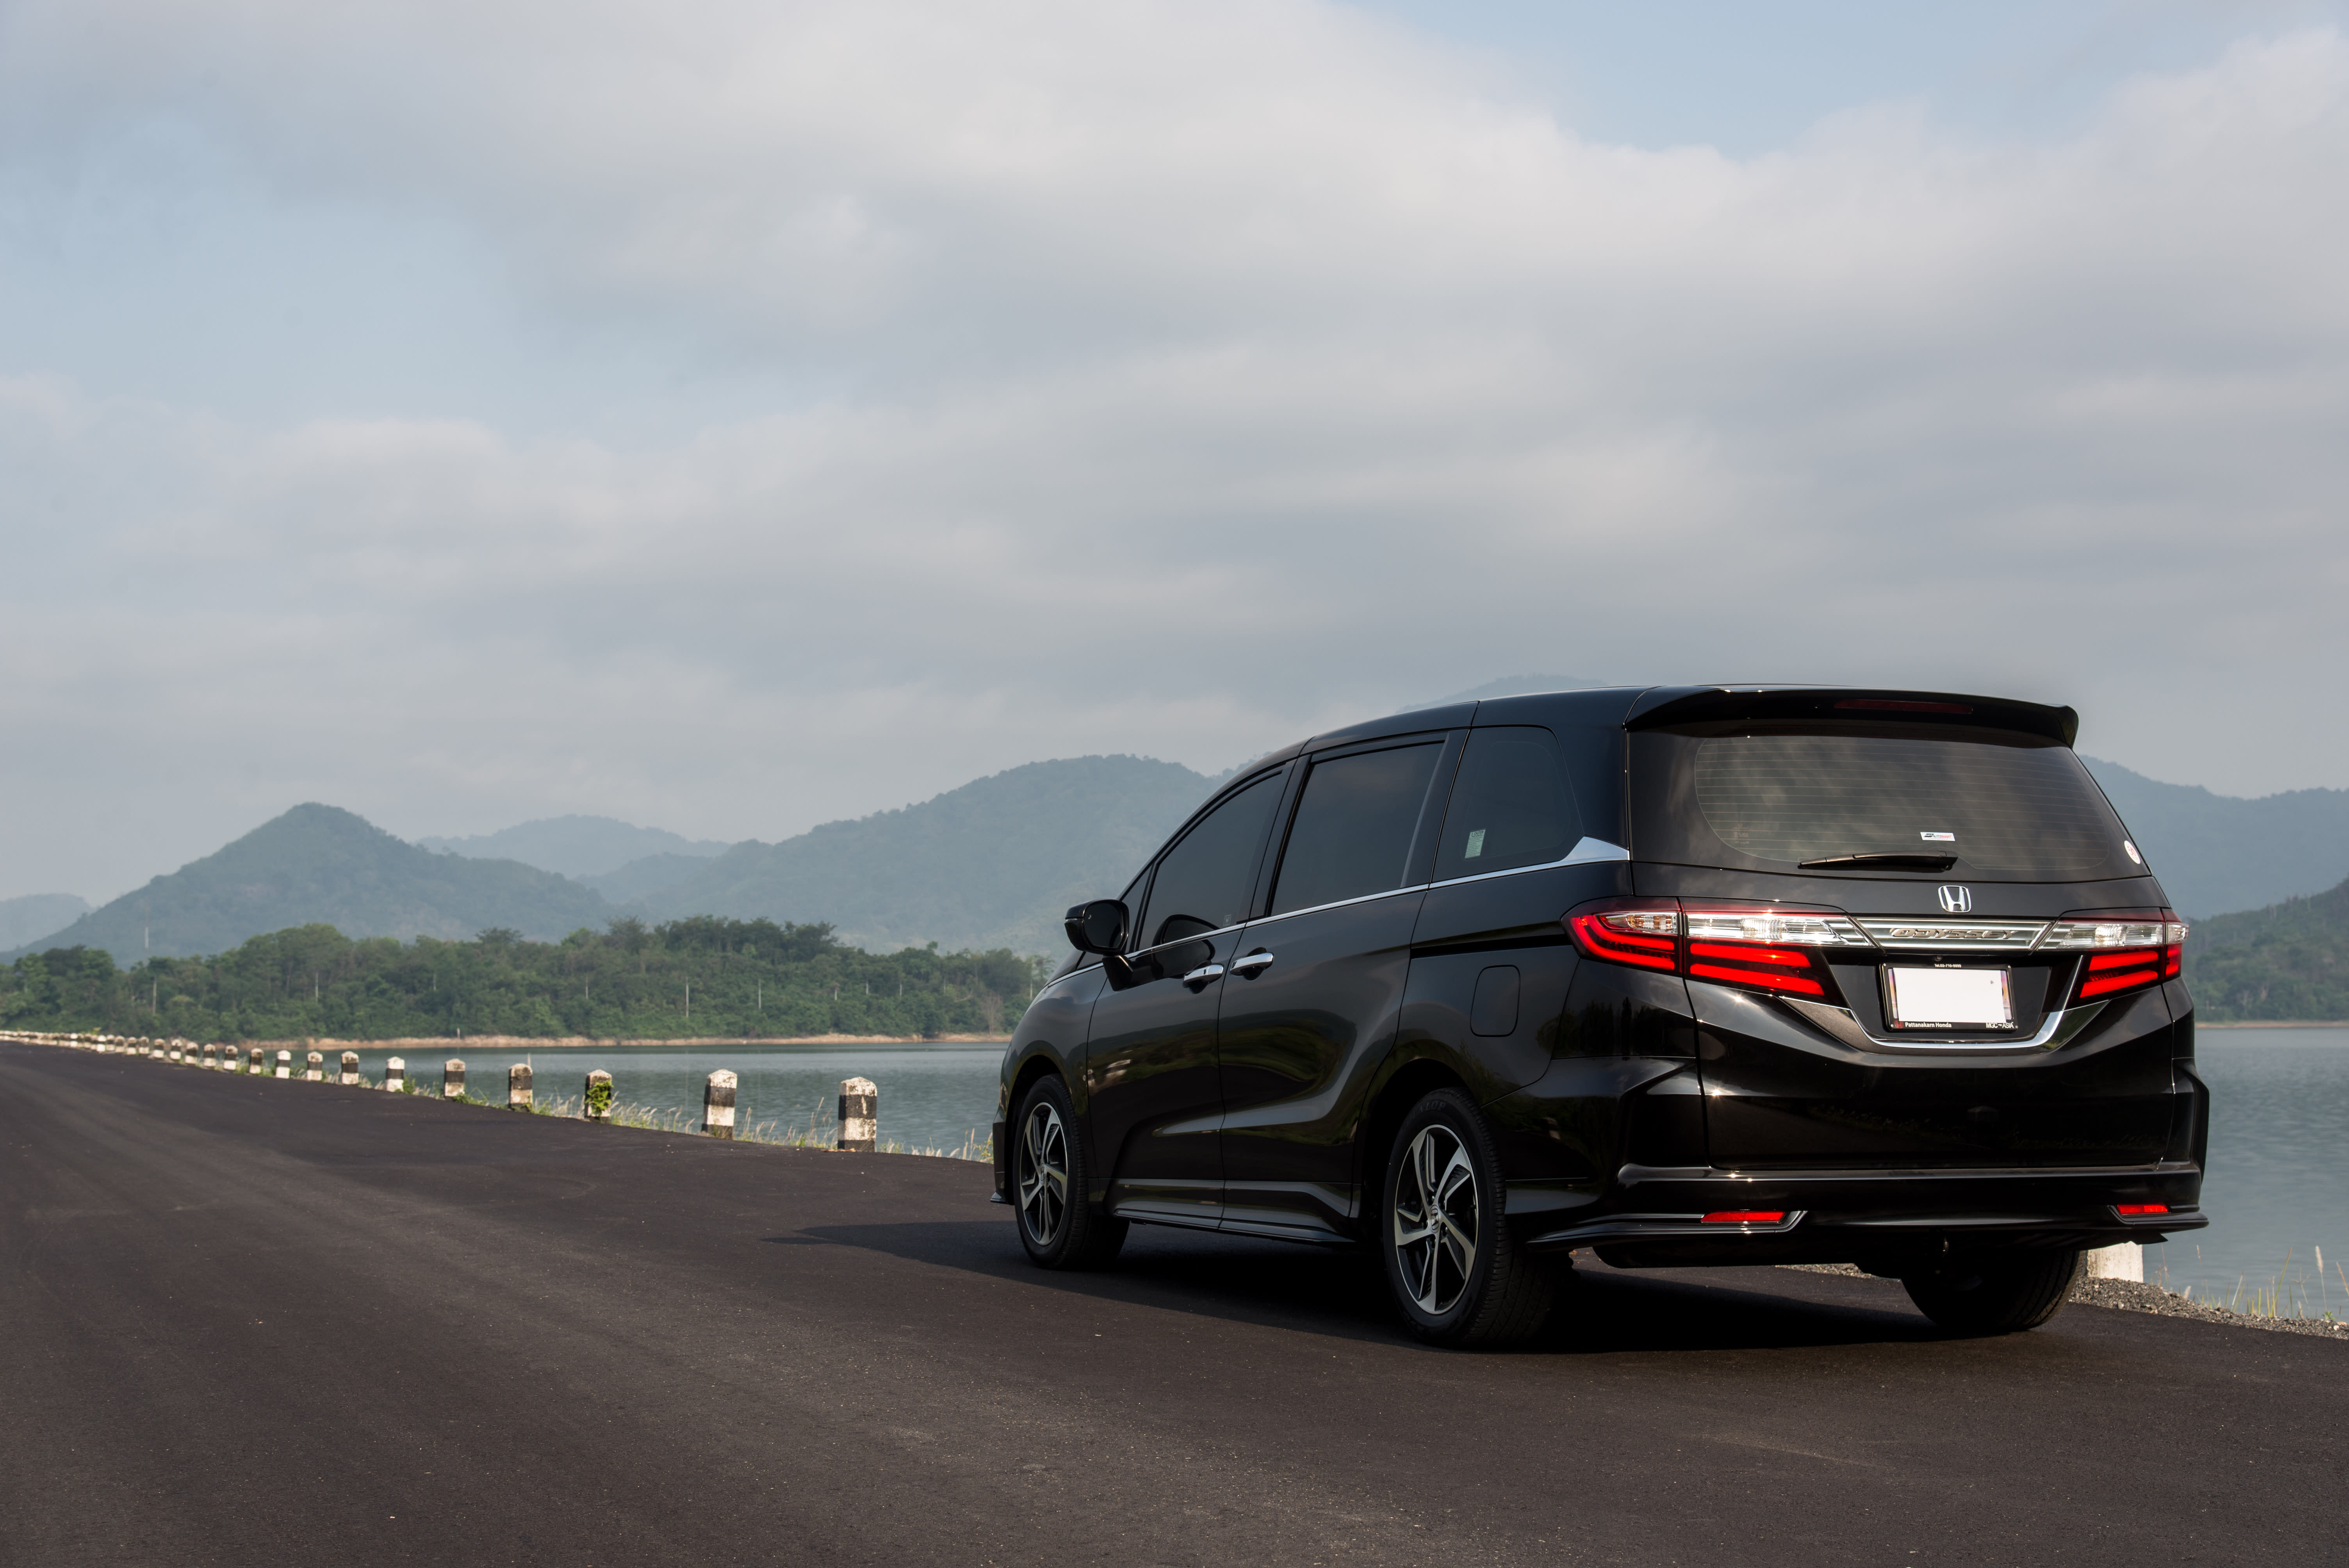 Honda recalls minivans  for rear view camera leak and software glitch